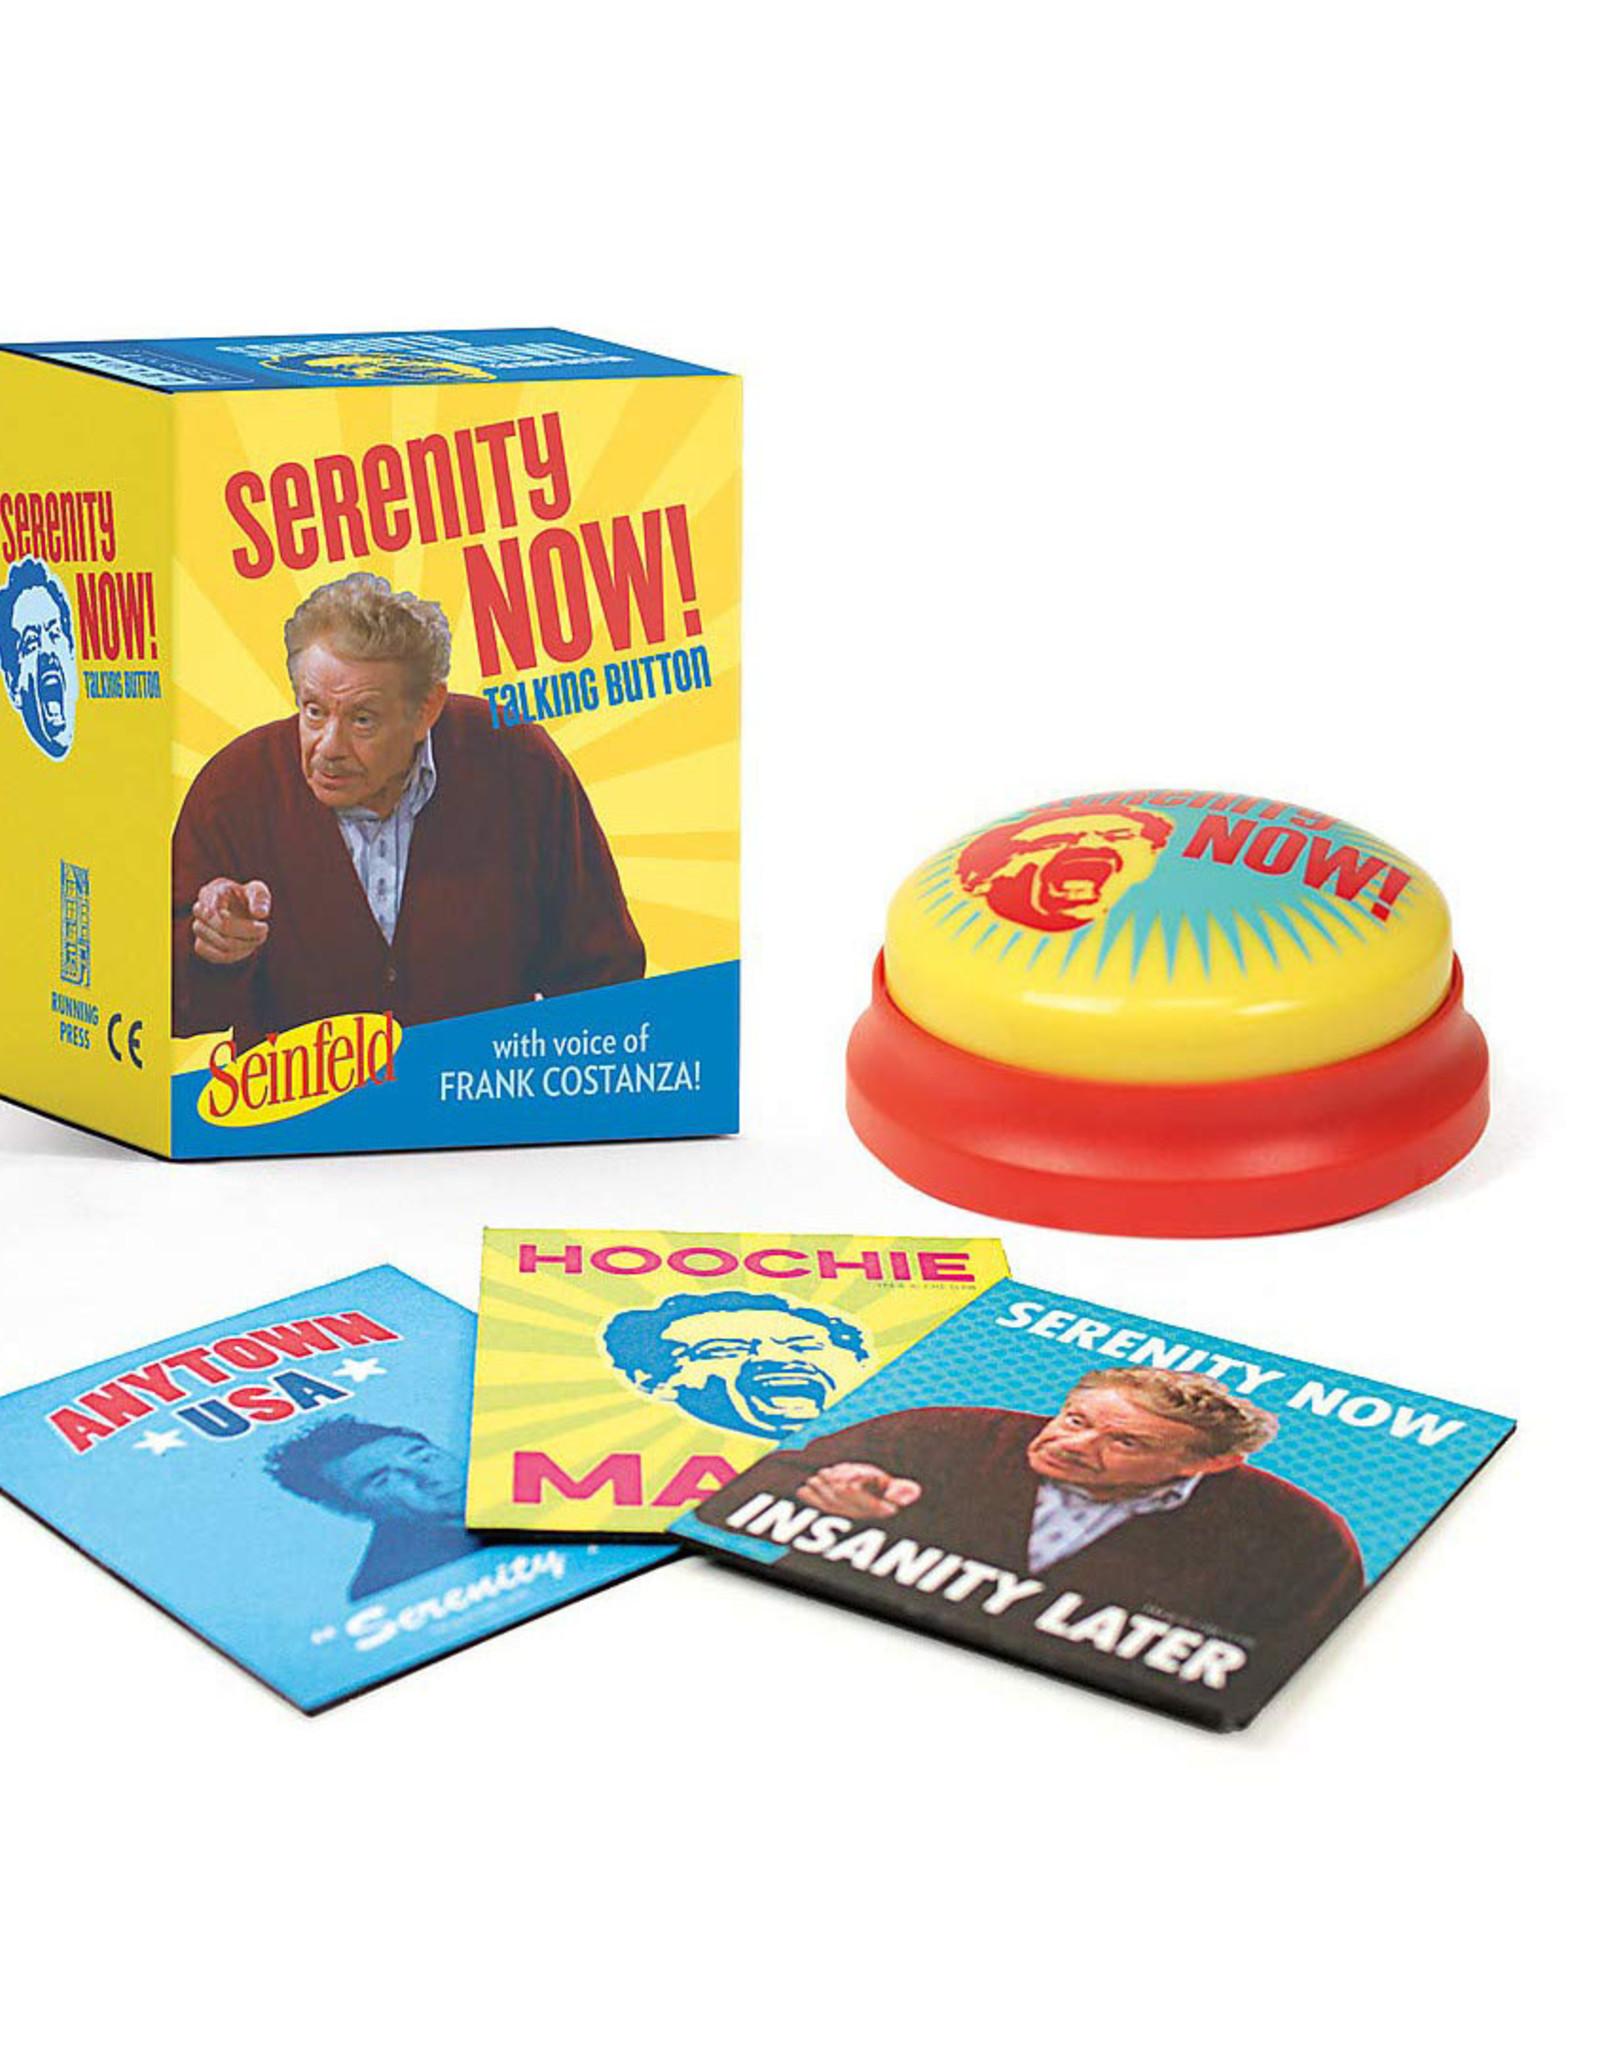 Serenity Now! Talking Button (Seinfeld)